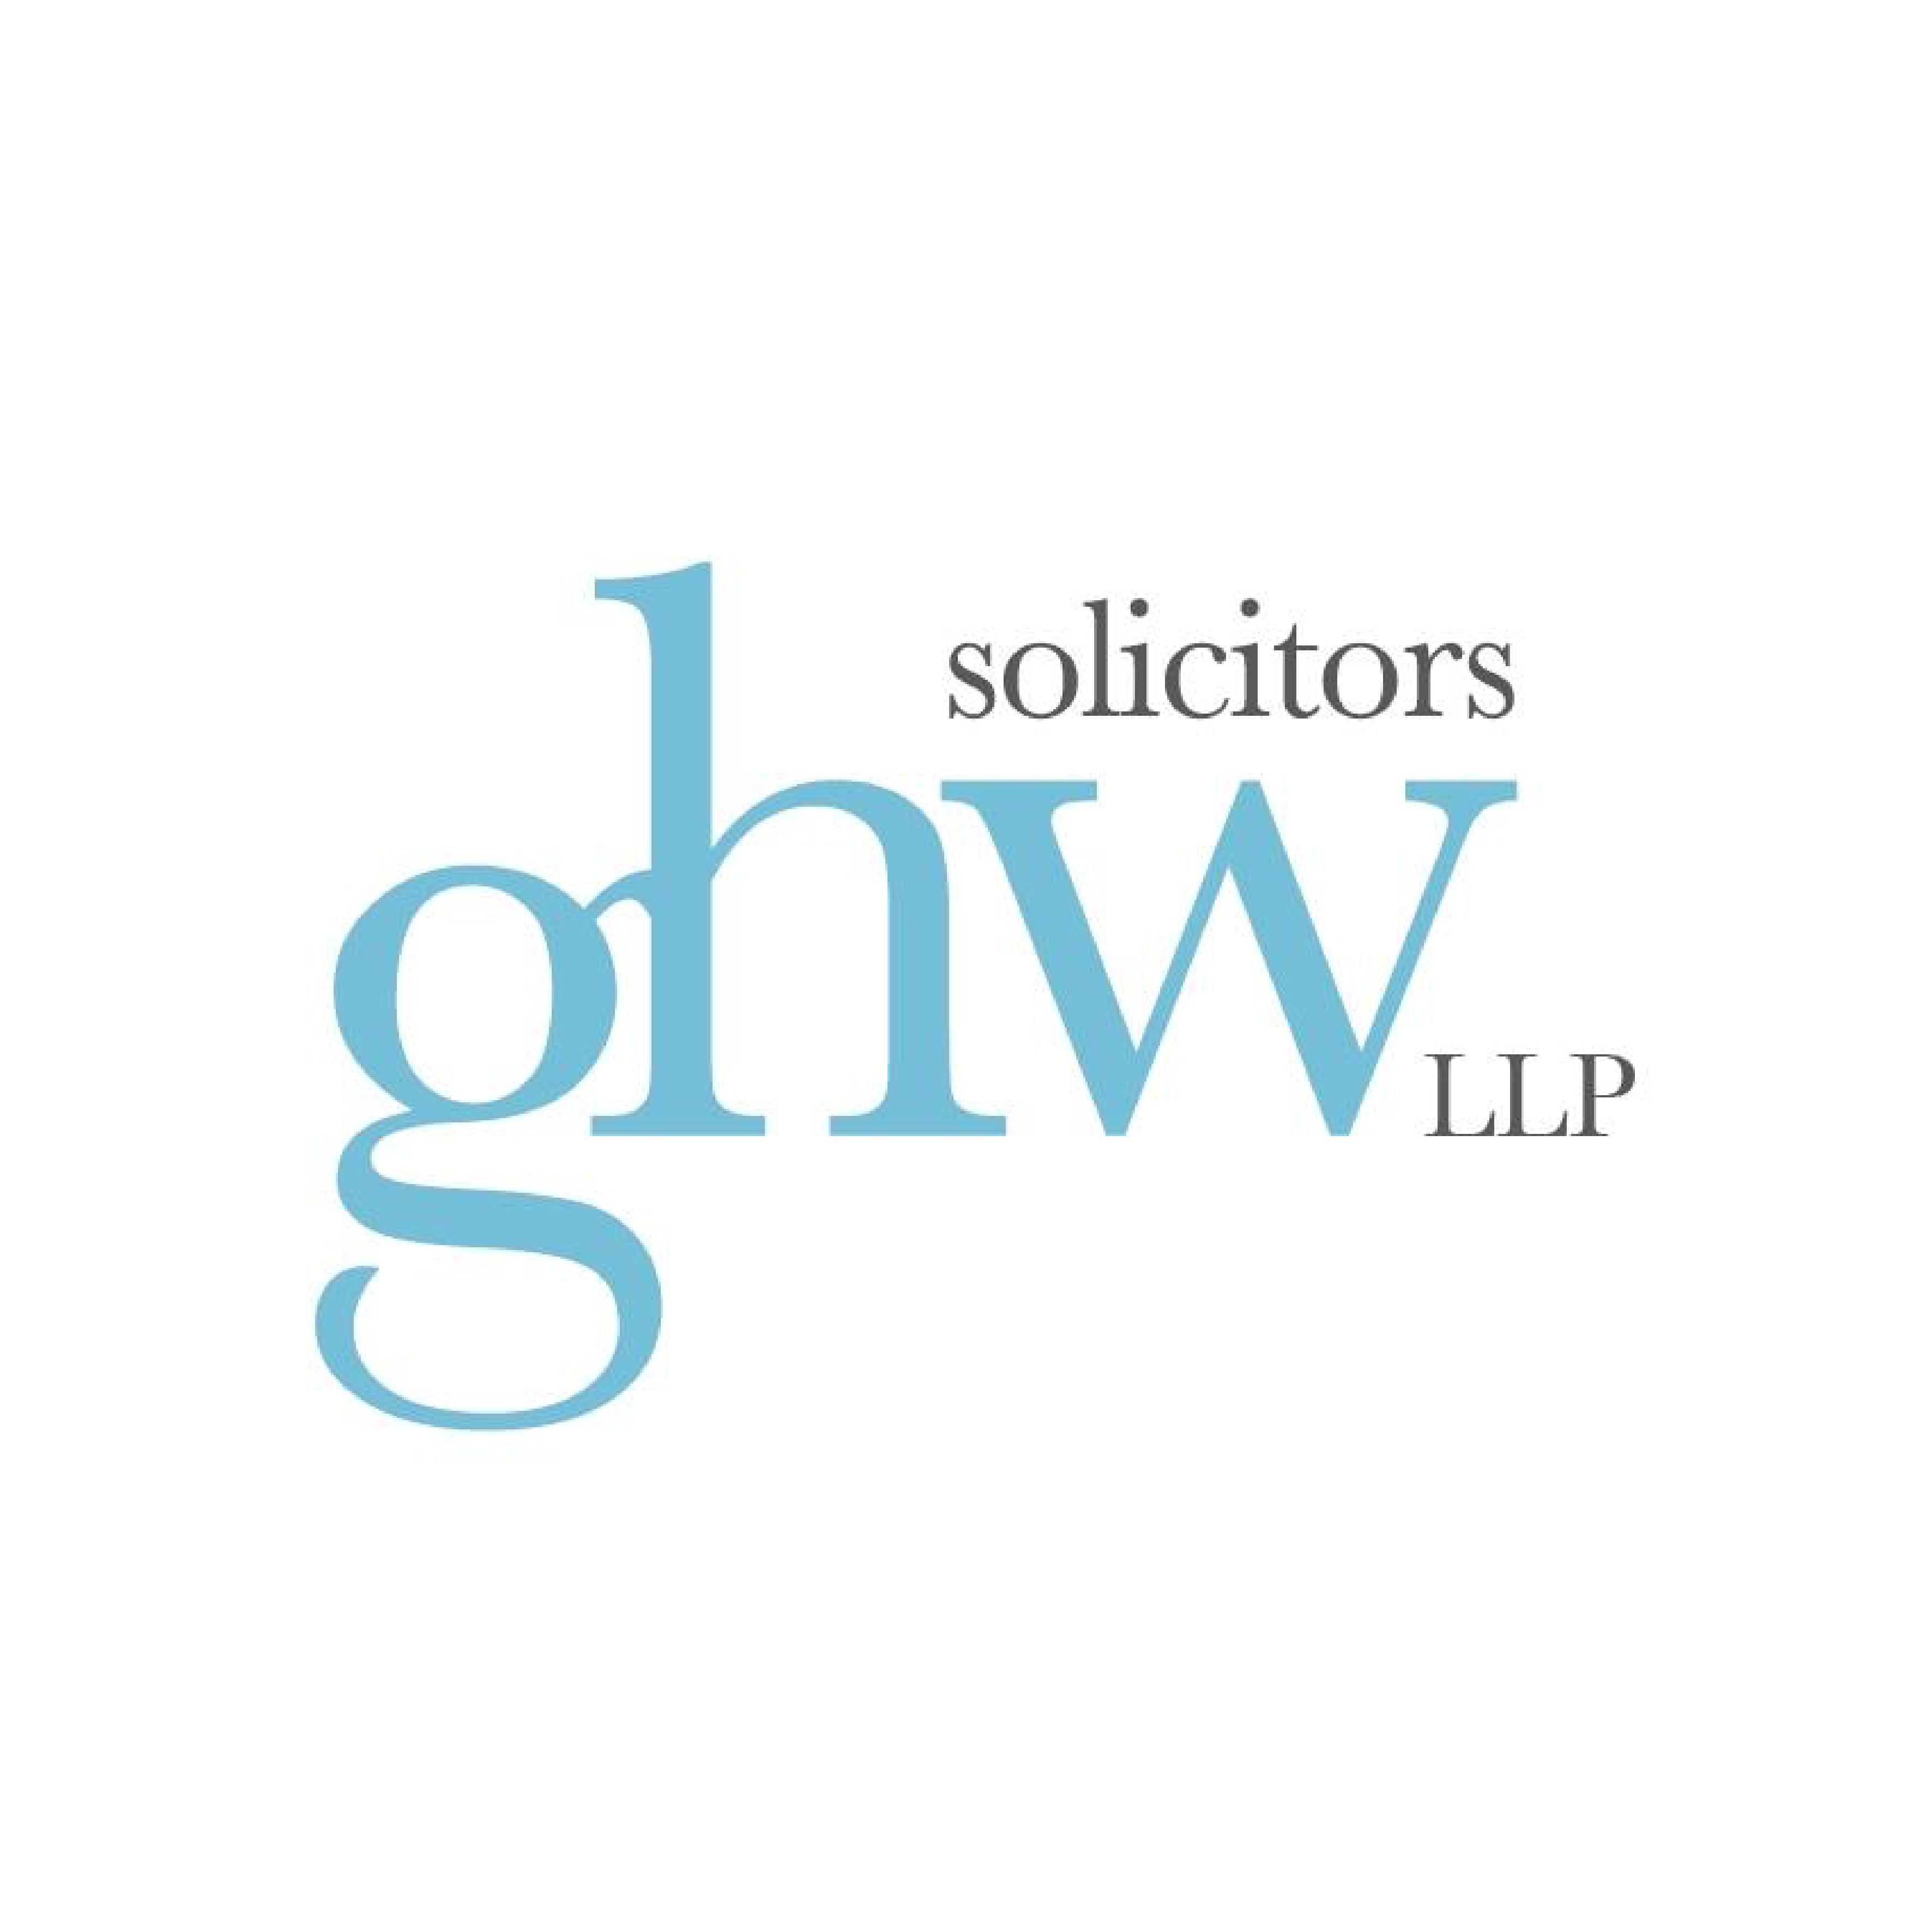 GHW Solicitors